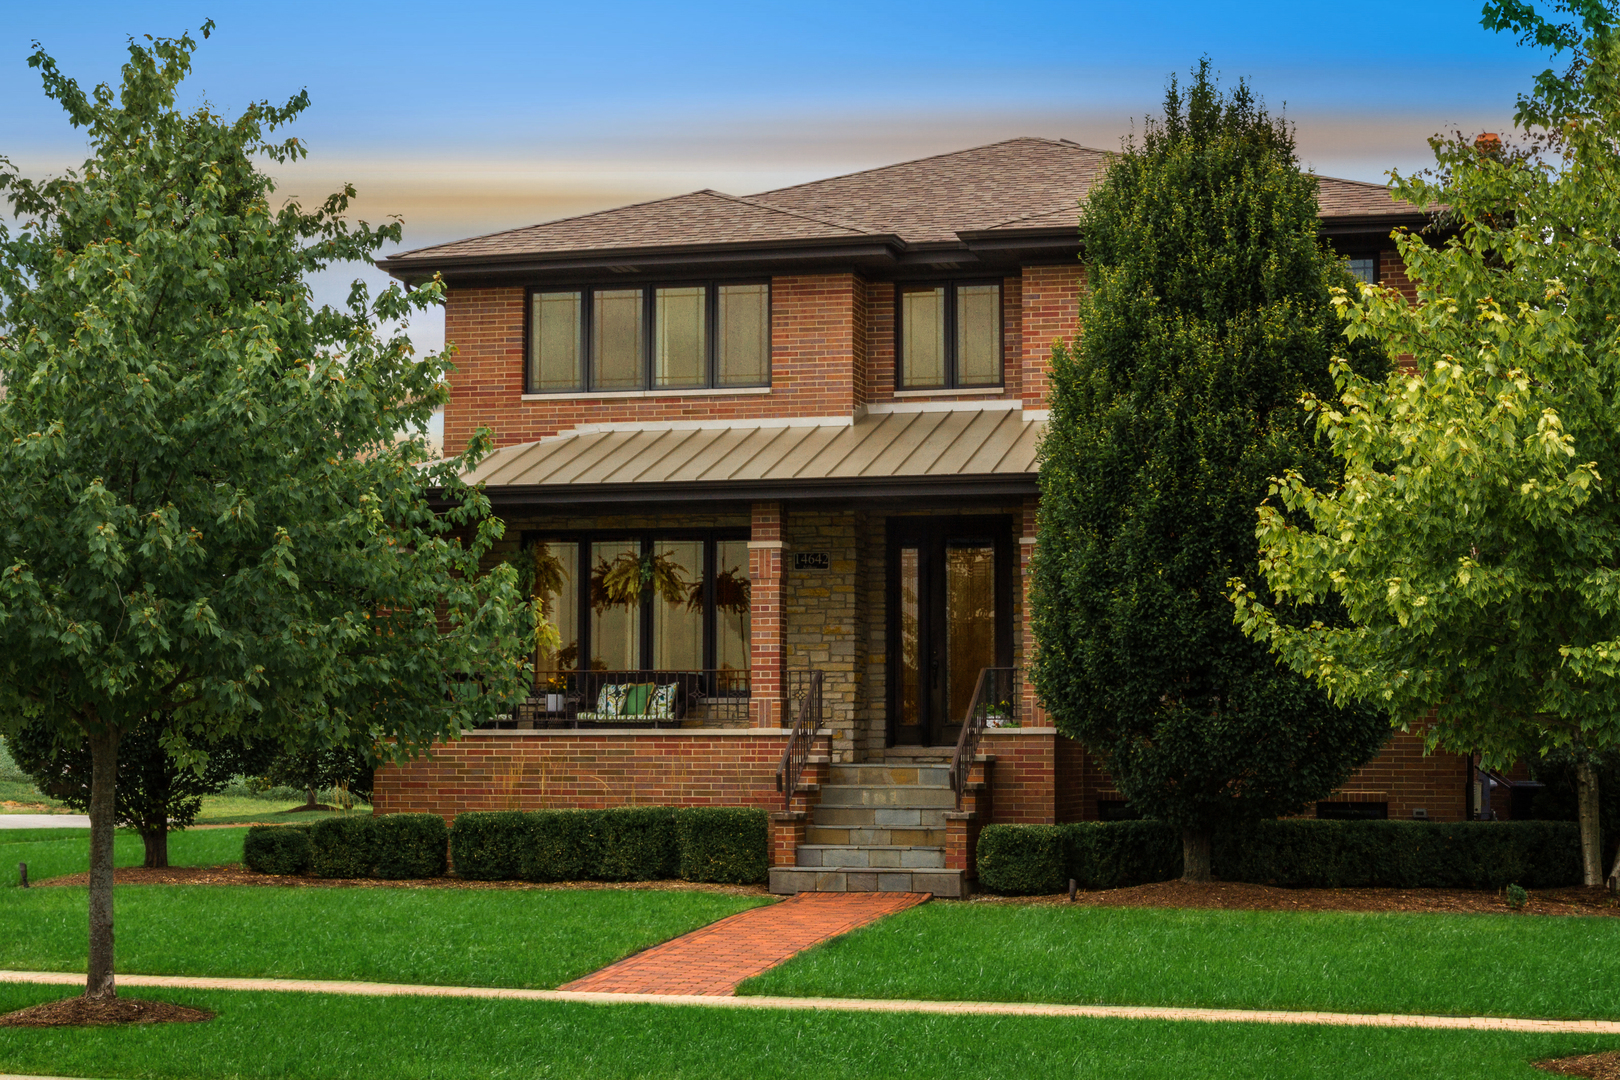 14642 Kildare Street, Homer Glen in Will County, IL 60491 Home for Sale